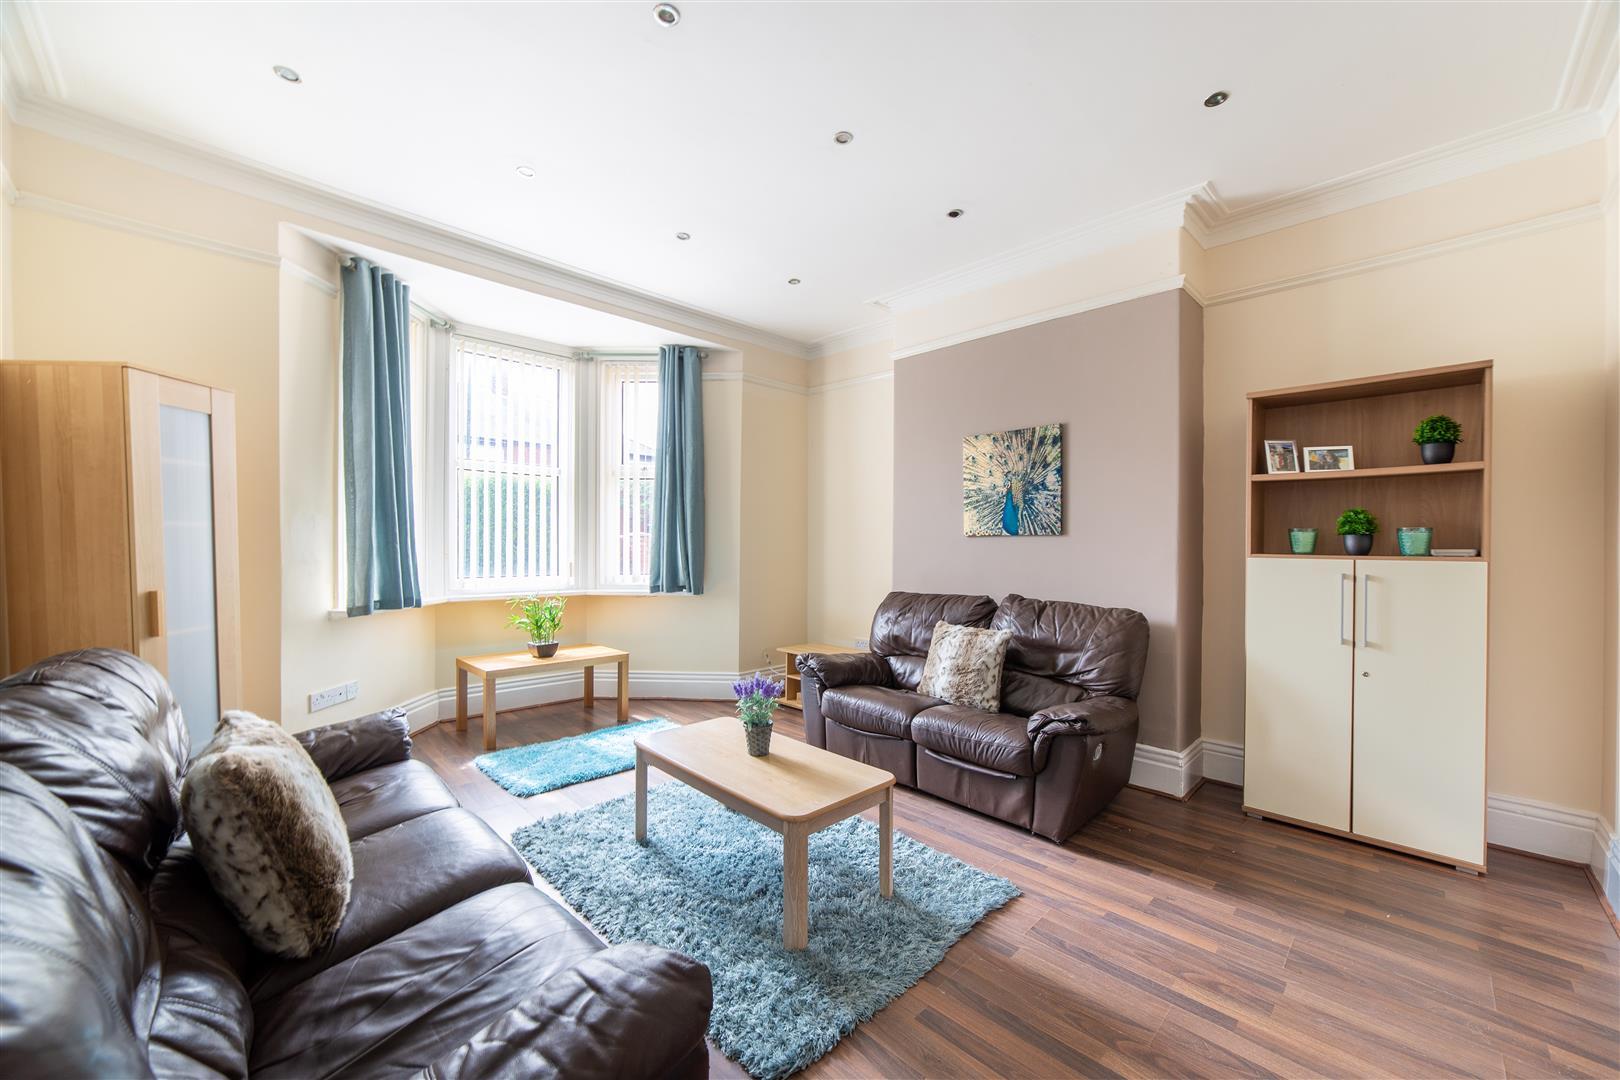 4 bed terraced house to rent in Newcastle Upon Tyne, NE6 5DE, NE6